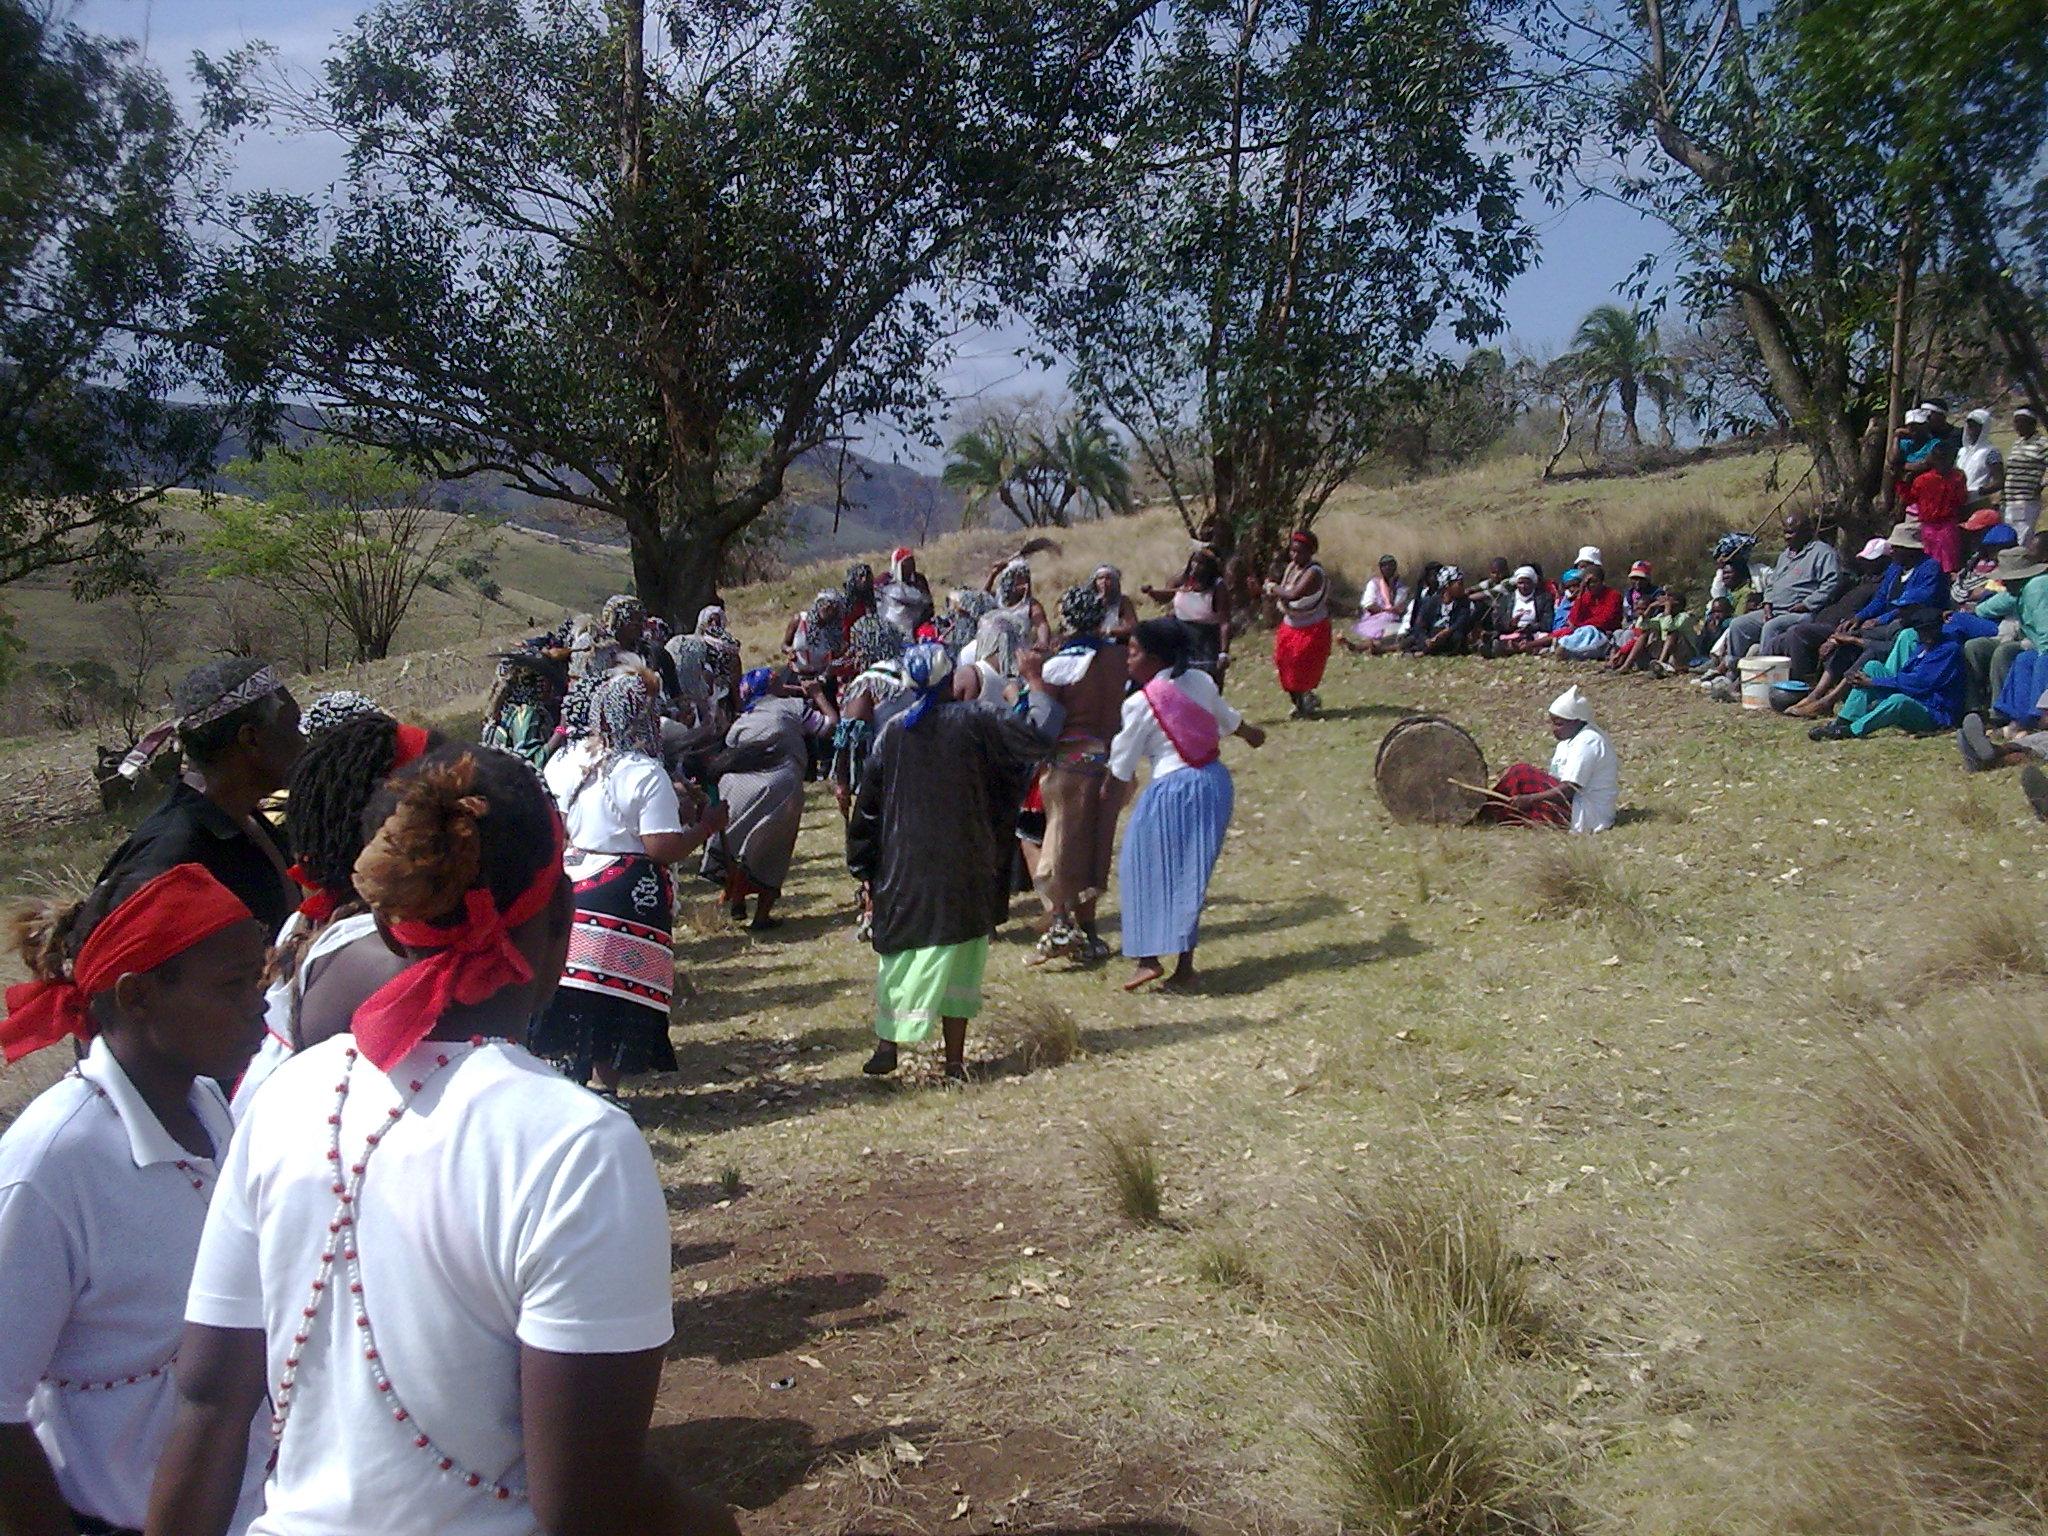 Annual Sangoma ceremony in Zululand /static/Zulu/Image038.jpg